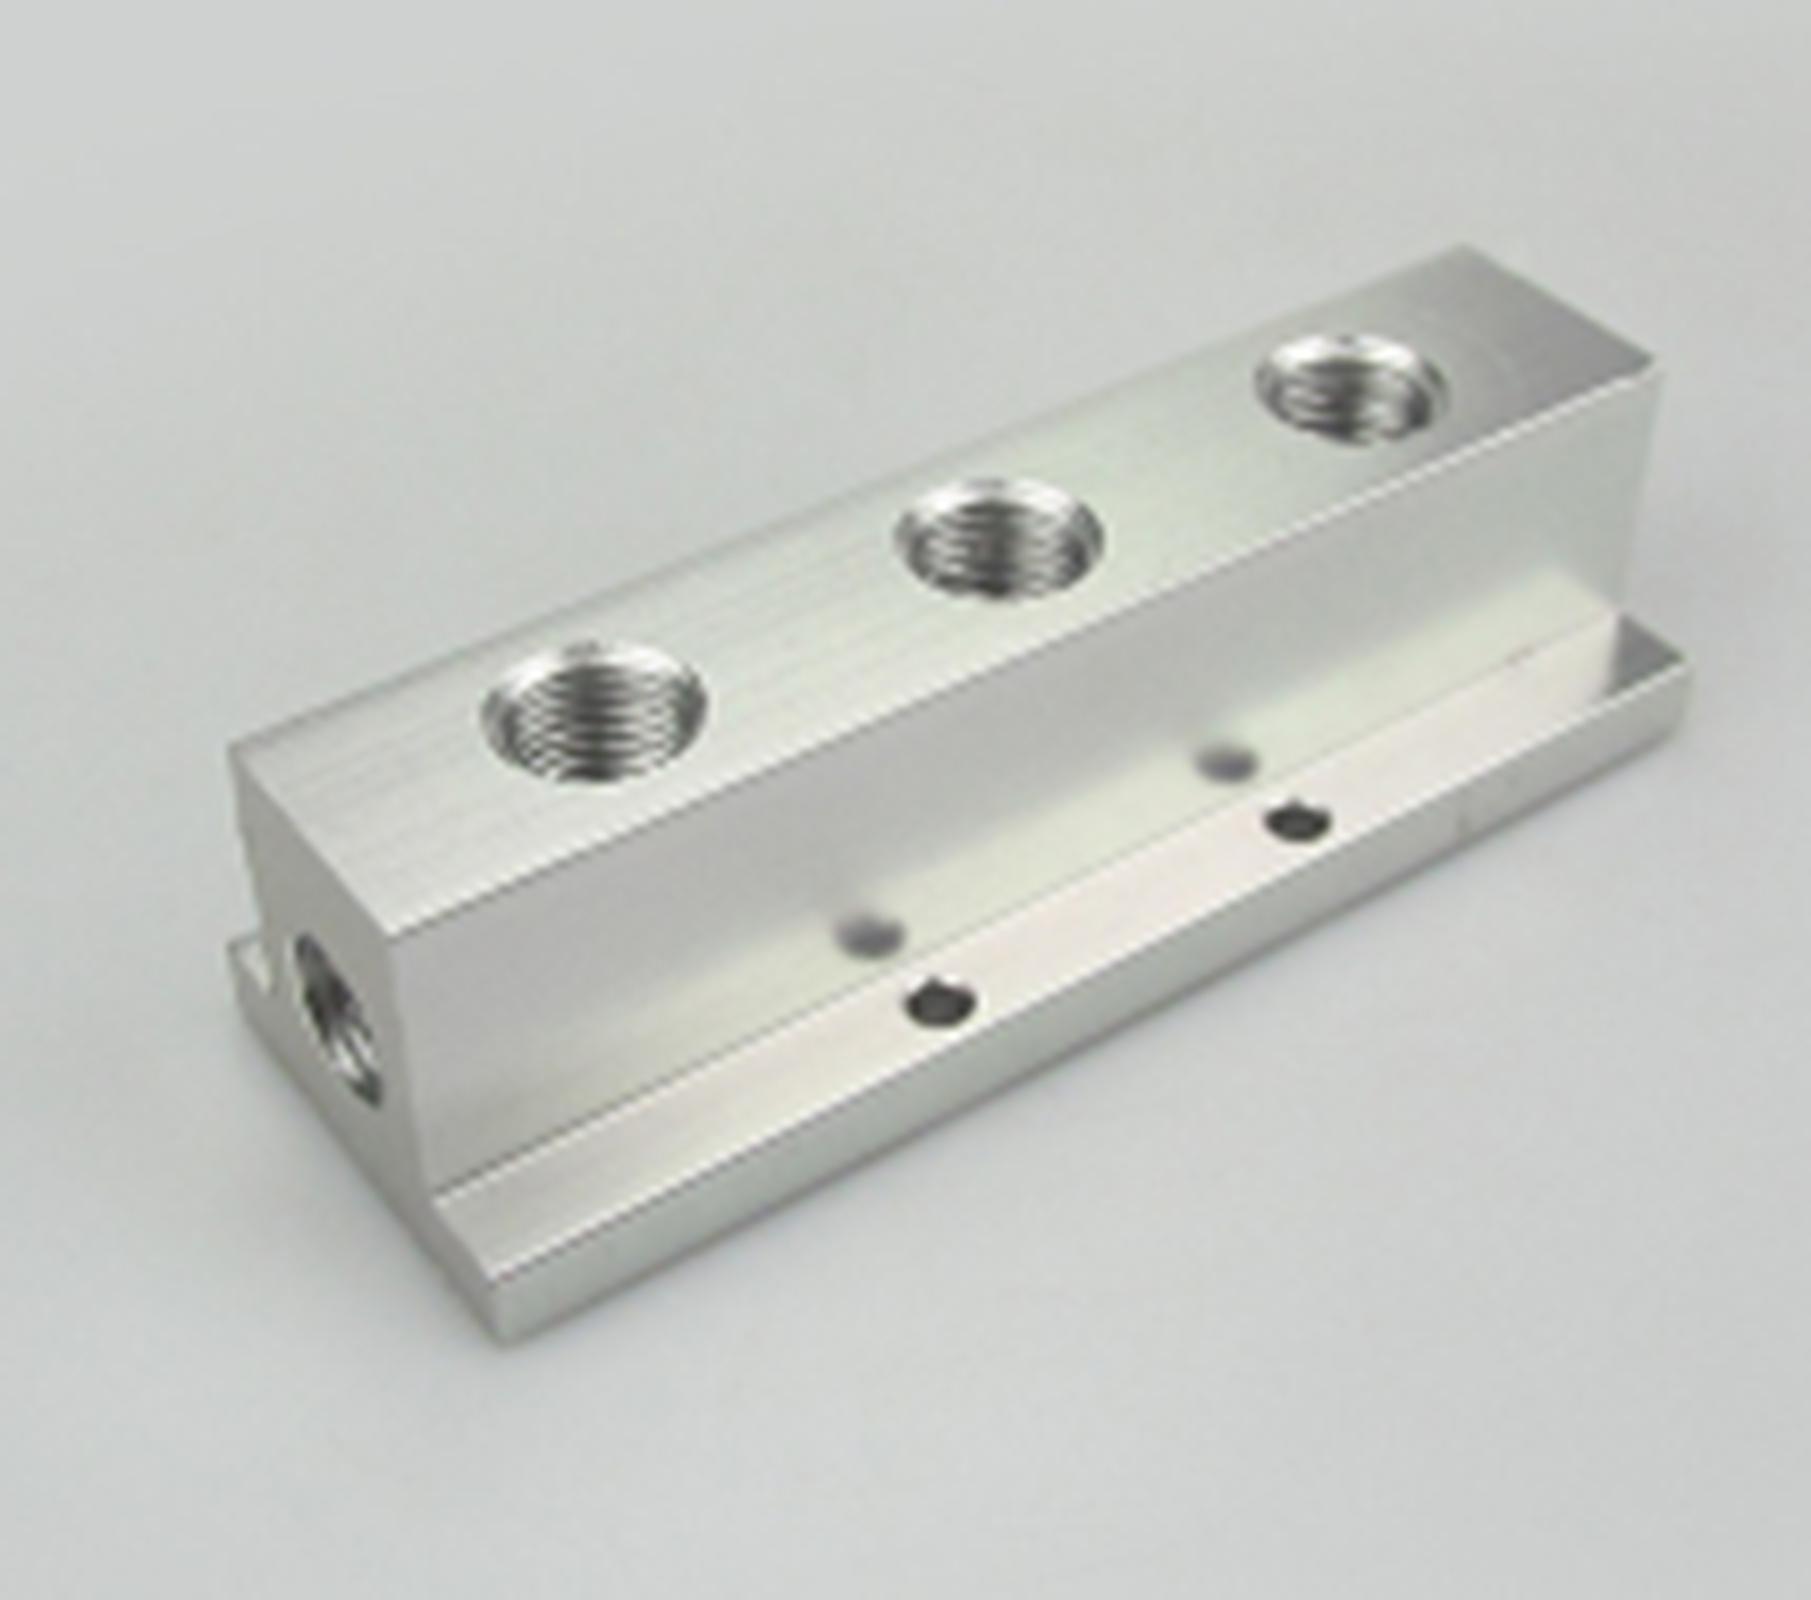 1/4 BSP Female 3 Way Solid Aluminum T-Shape Air Manifold Block Splitter g 1 1 4 11 tpi bsp parallel british standard pipe tap